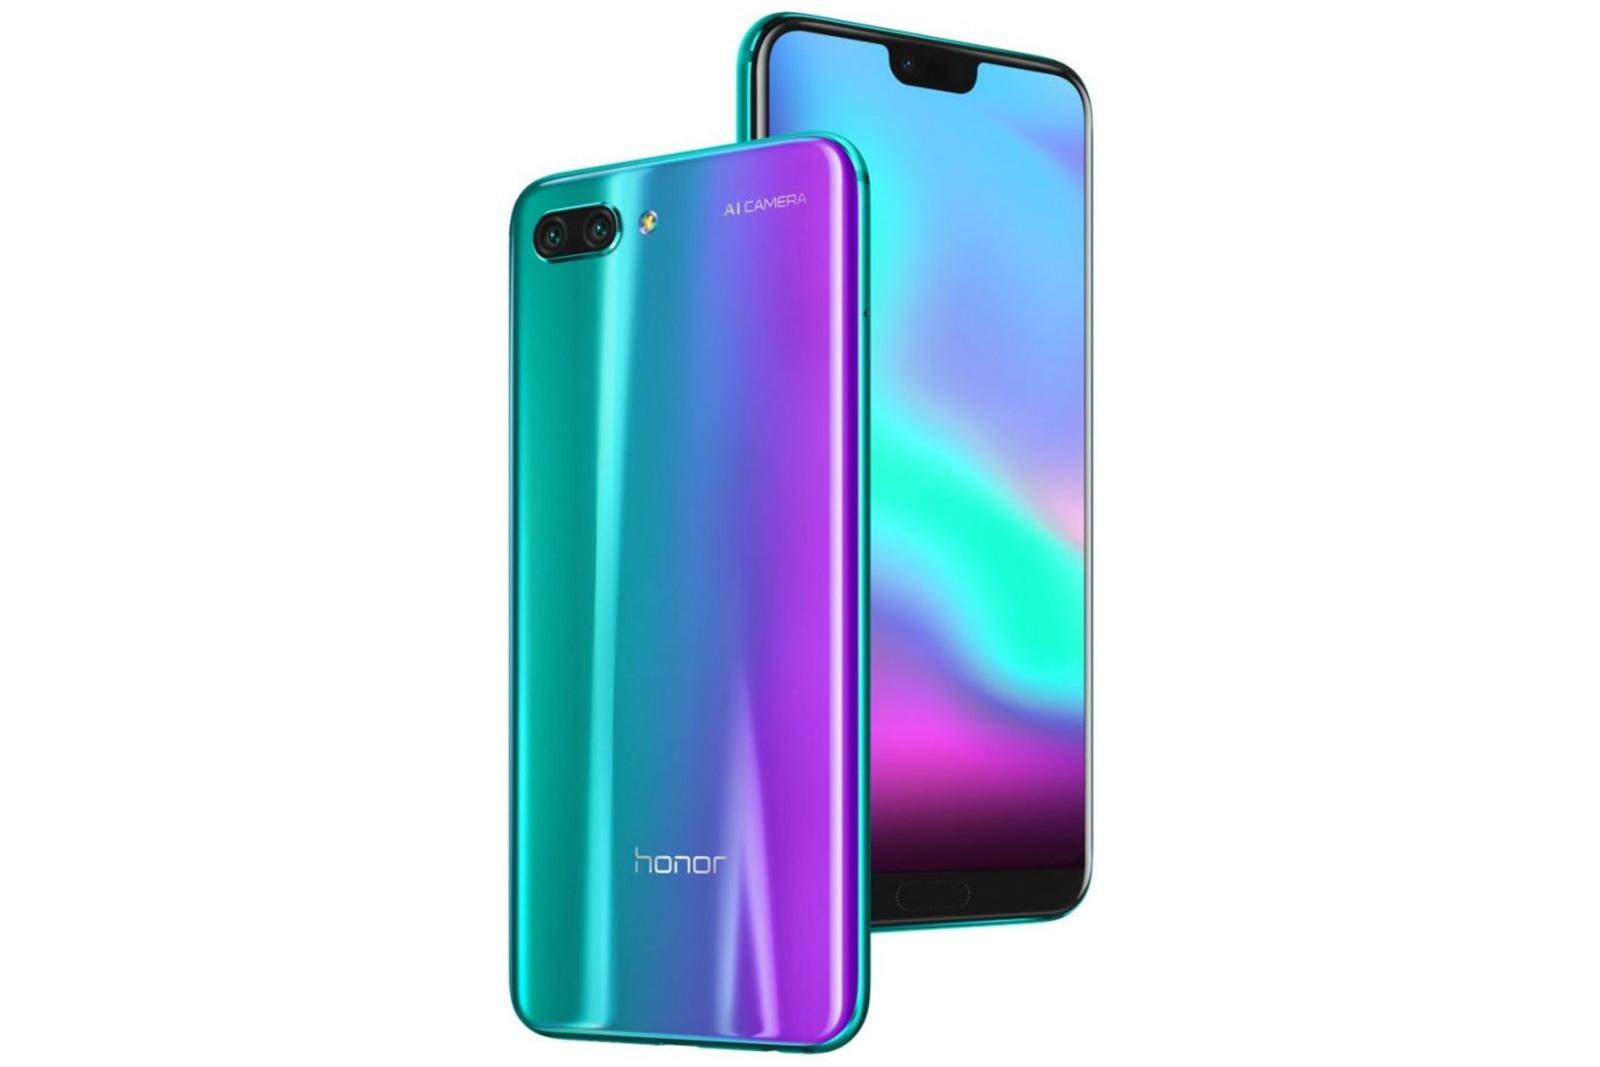 Как фотографирует новый Honor 10. Сравниваем с Huawei P20 и iPhone 7 Plus - 4